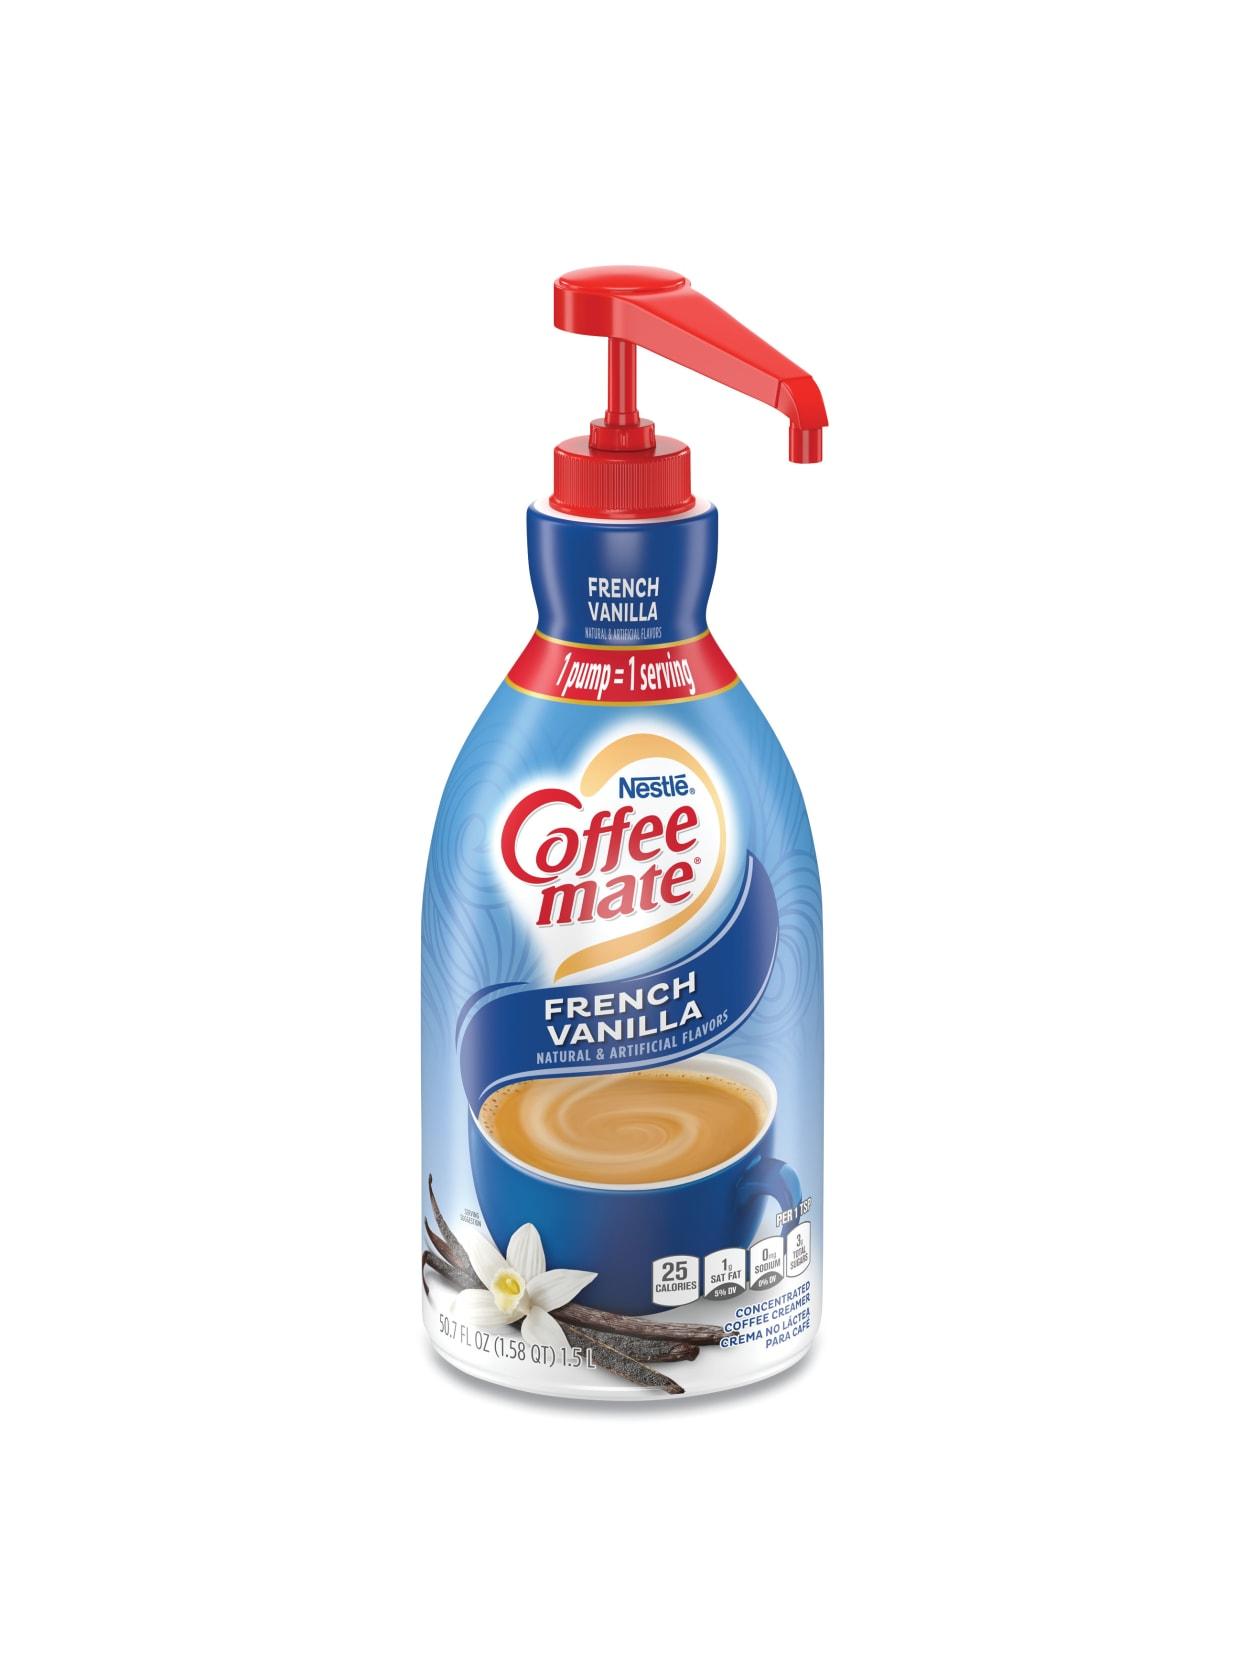 Nestl Coffee Mate Liquid Creamer French Vanilla Flavor 50 72 Oz Multiple Serve X 1 Office Depot